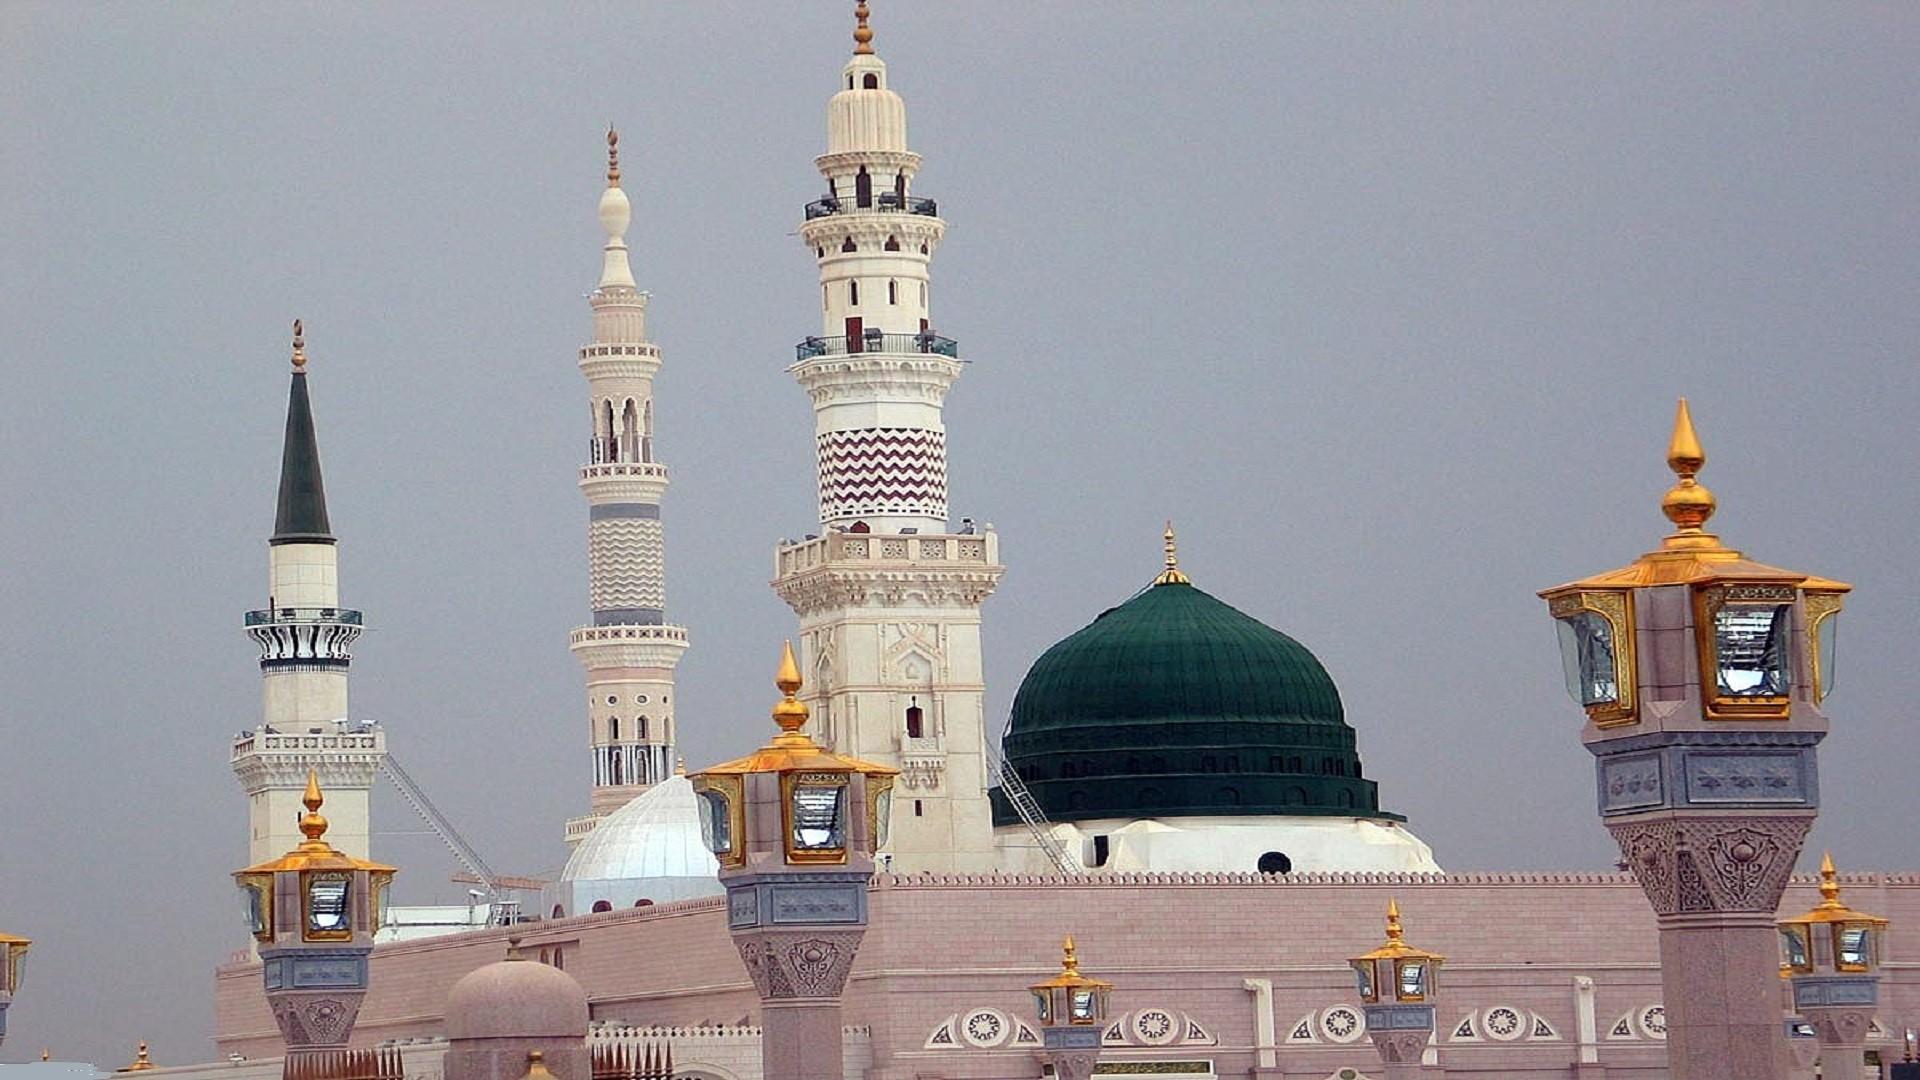 Mecca Hd Wallpaper 70 Images